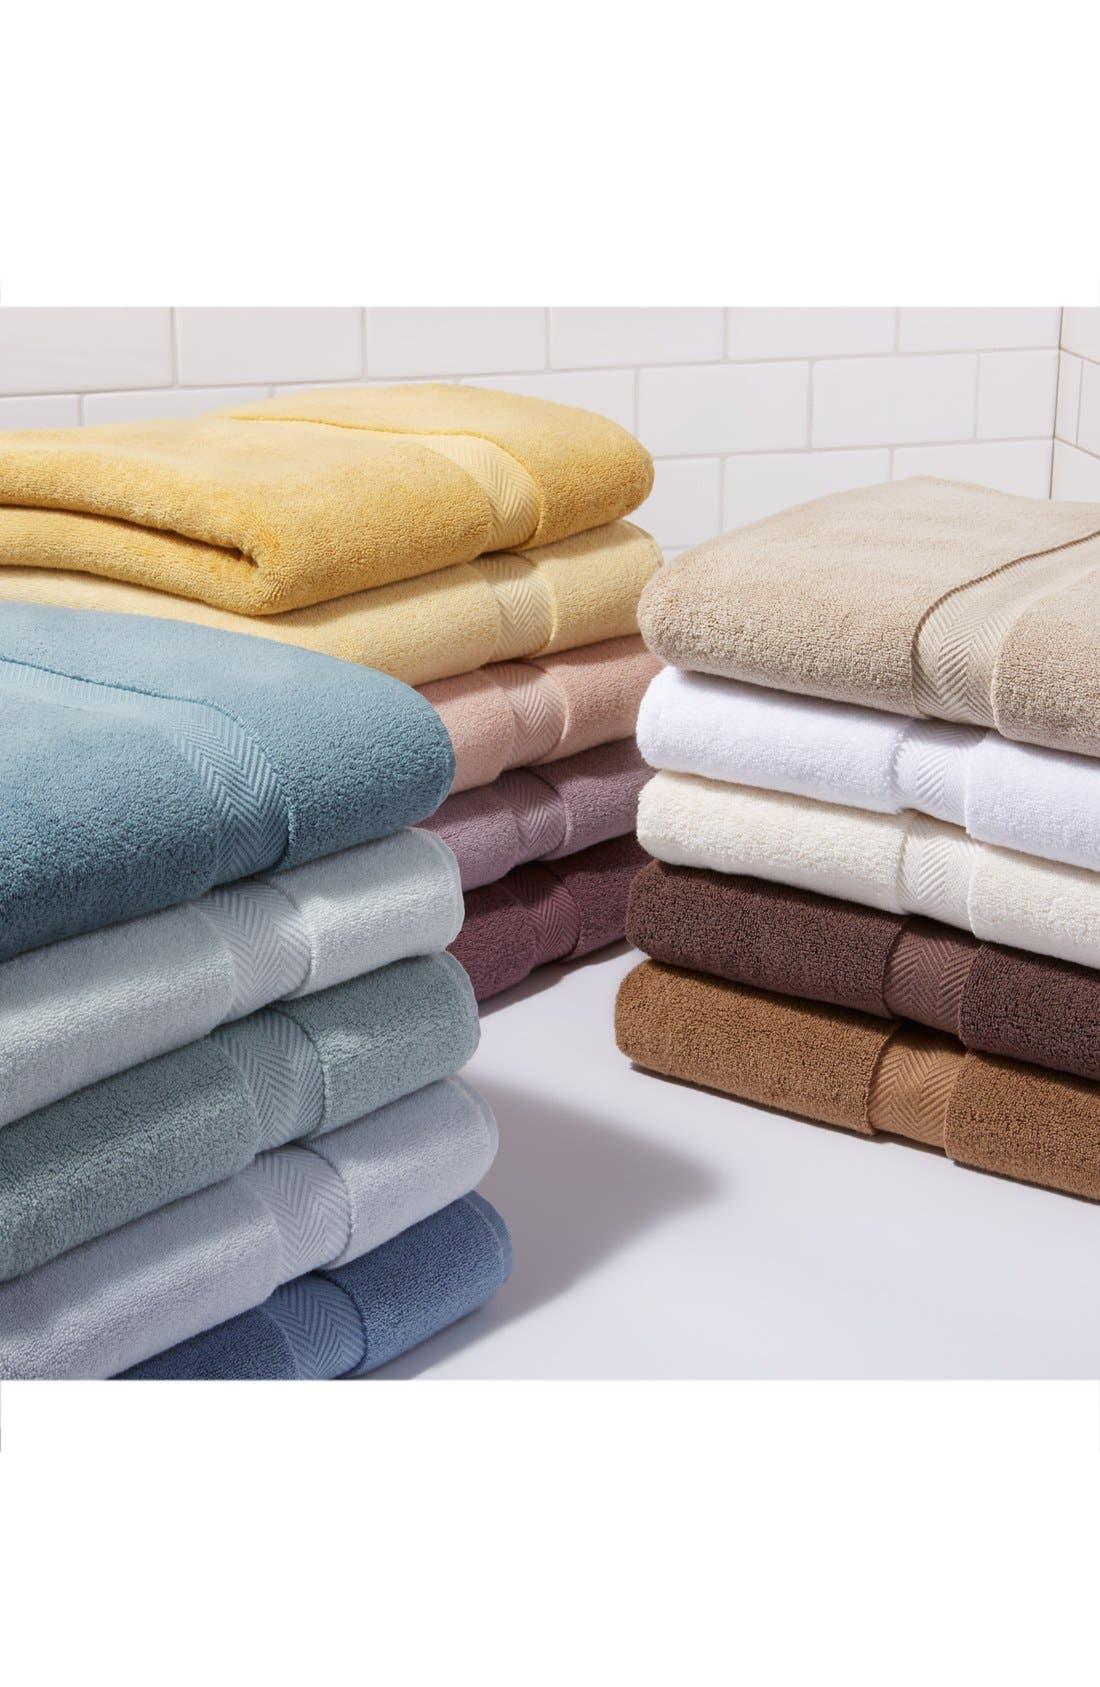 Hydrocotton Bath Towel,                             Alternate thumbnail 4, color,                             GREY VAPOR